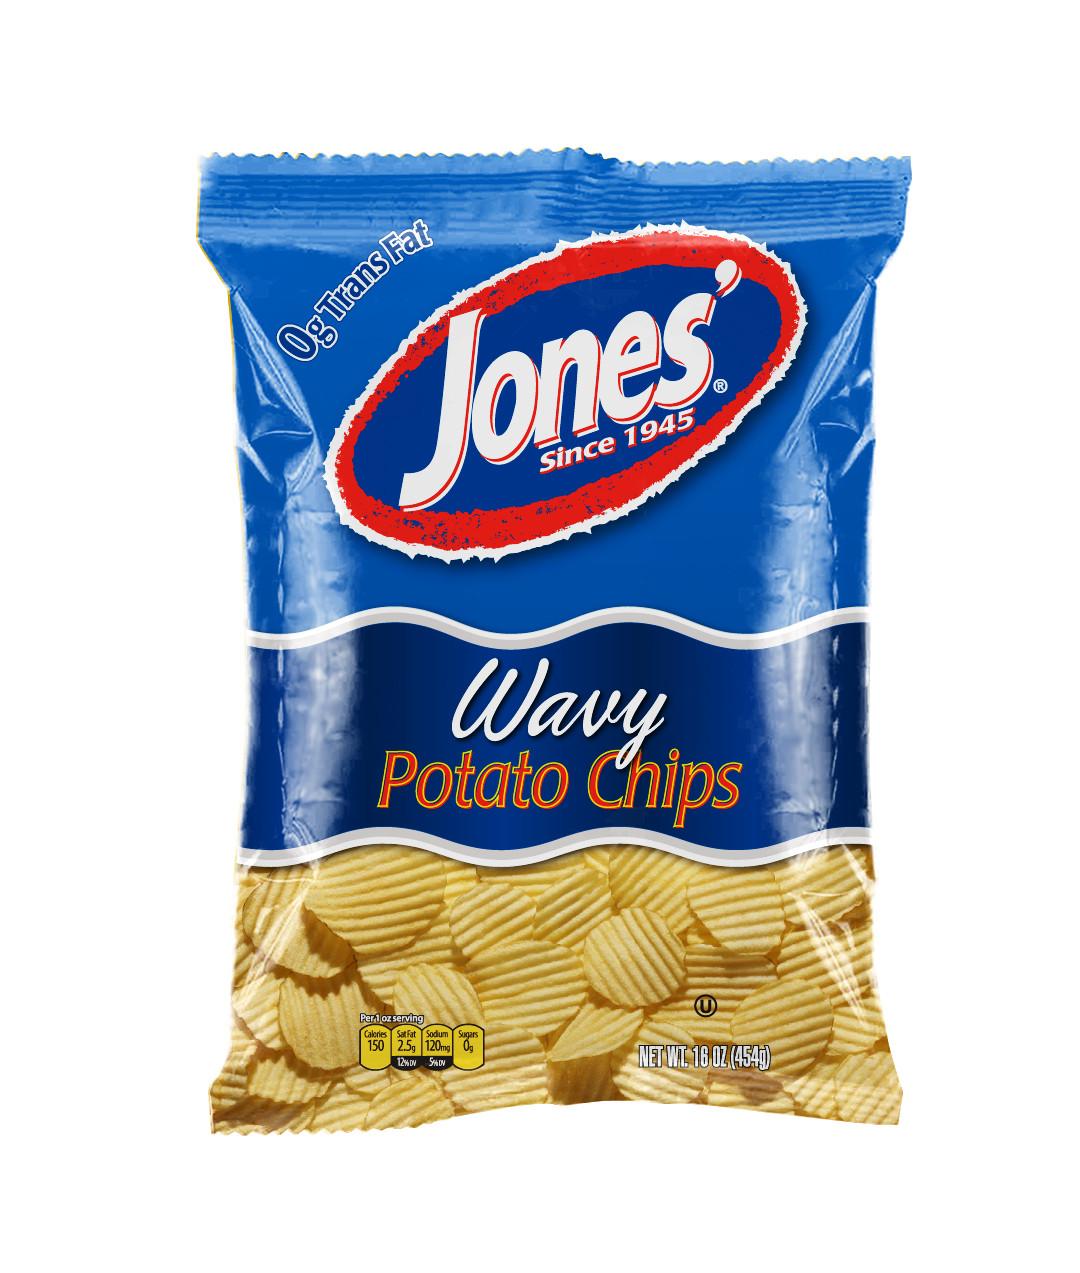 Jones Potato Chips  Potato Chips and Crisps from Jones Potato Chip Co Chips